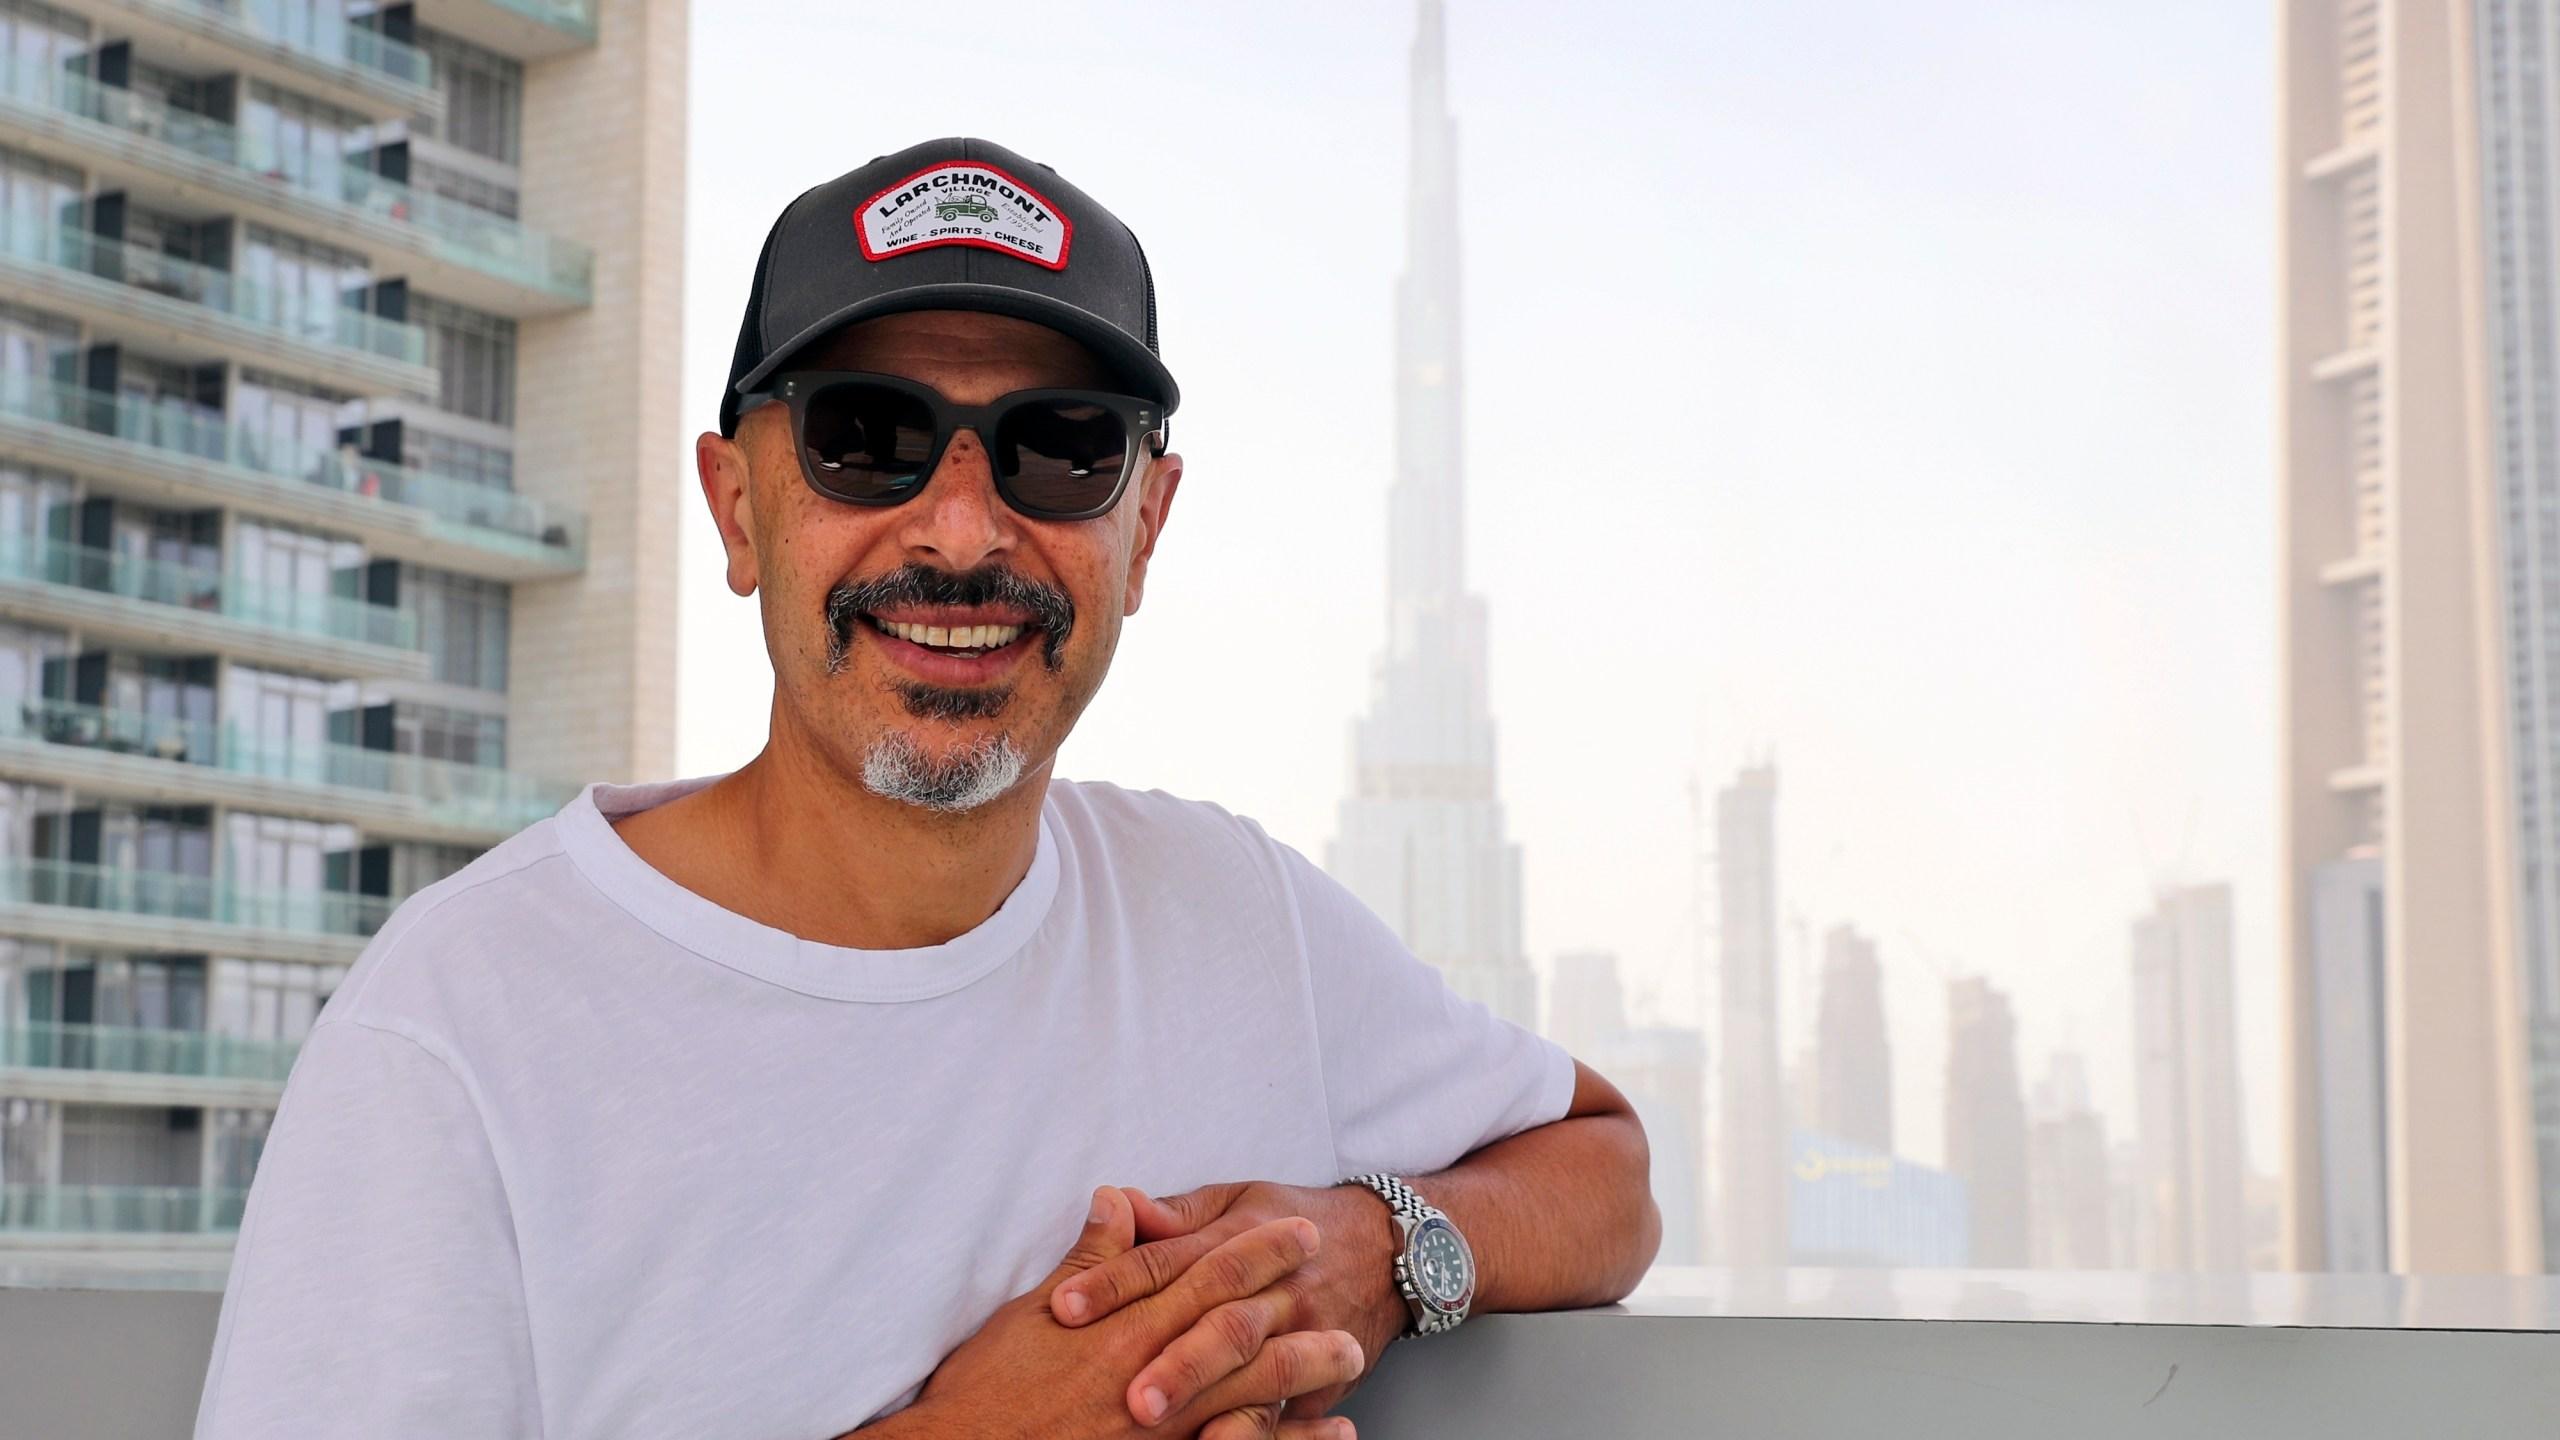 Stand-up comedian Maz Jobrani poses in Dubai, United Arab Emirates on May 25, 2021. (AP Photo/Kamran Jebreili)